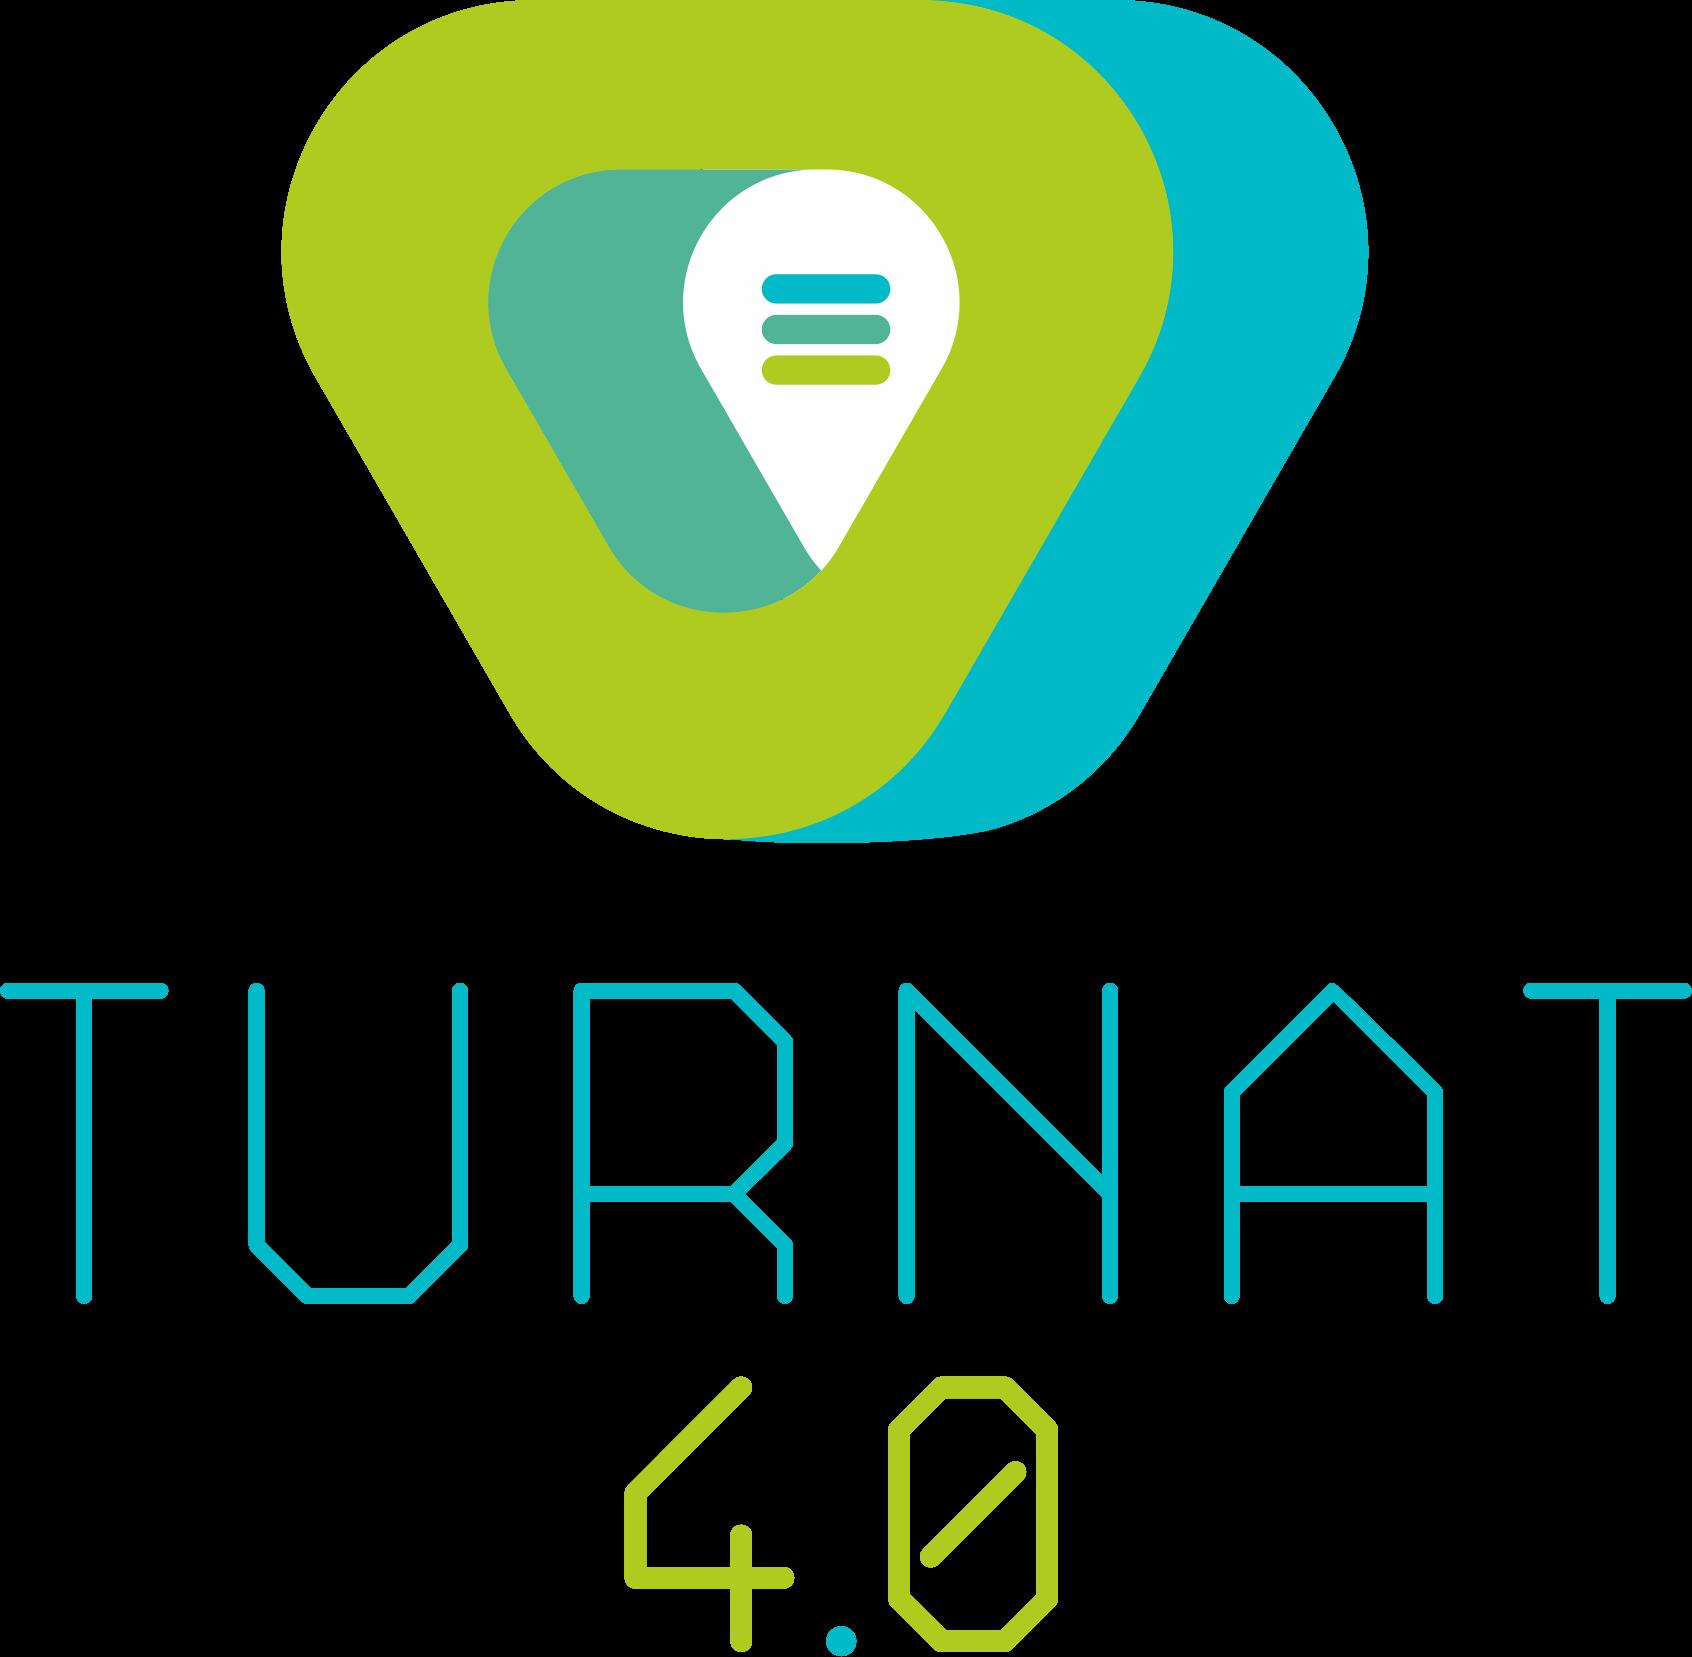 TURNAT 4.0